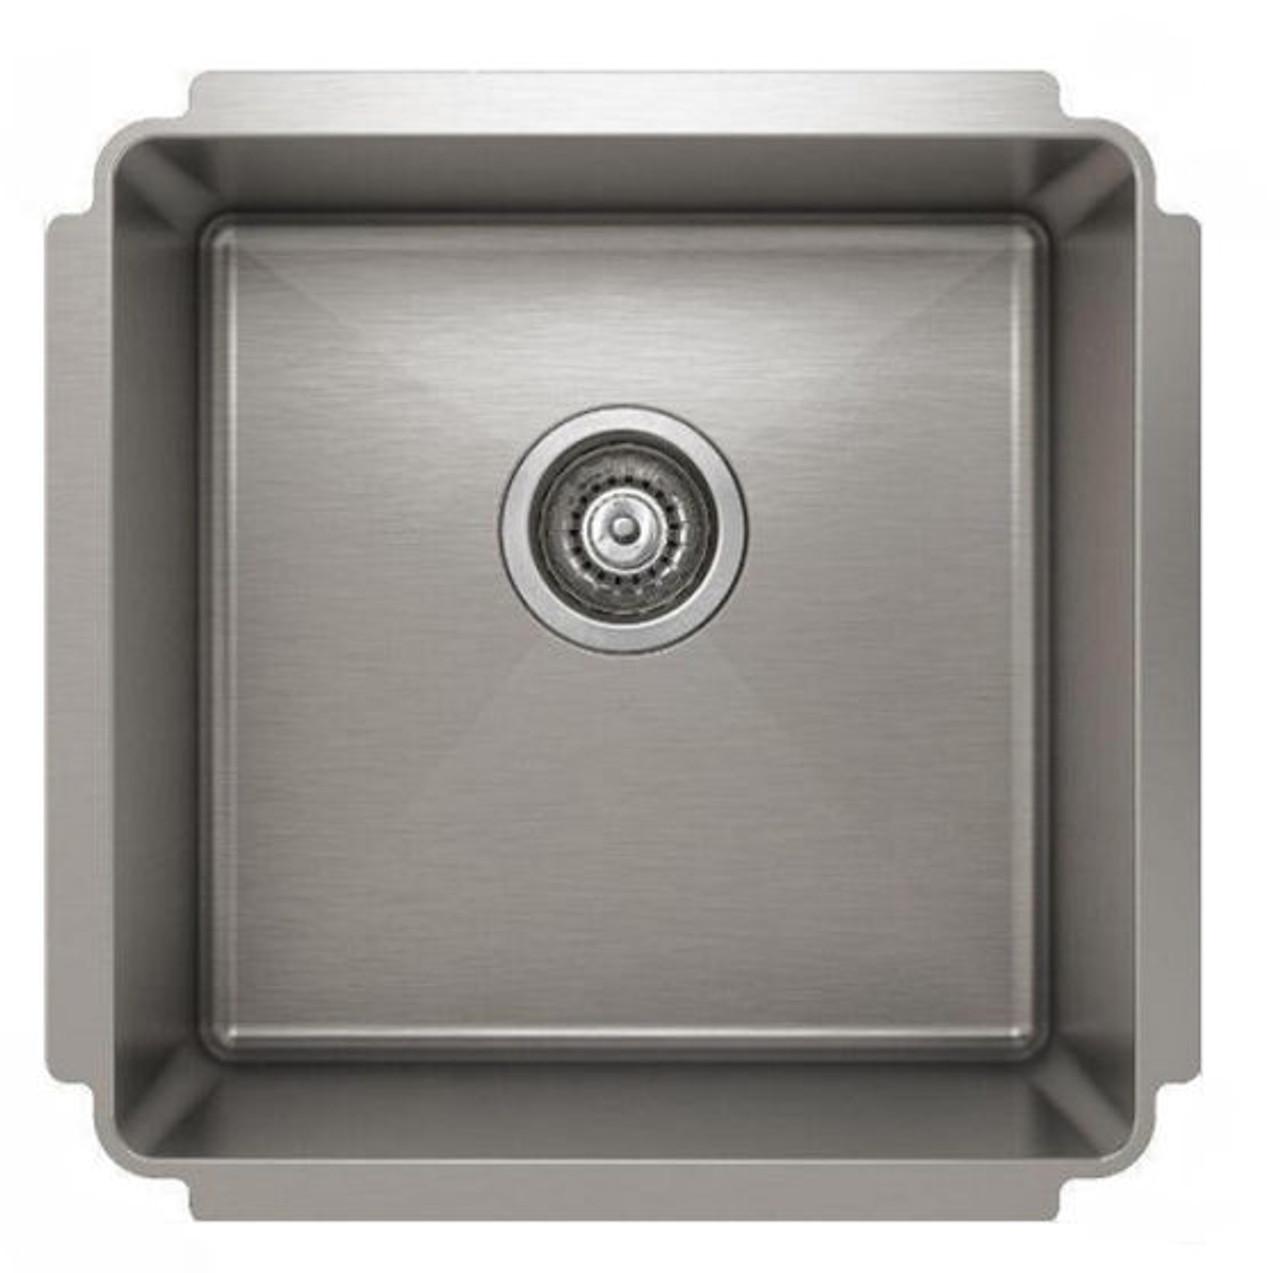 Pro Chef Prolnox IH75-18188 Undermount Single Bowl Kitchen Sink - Silver